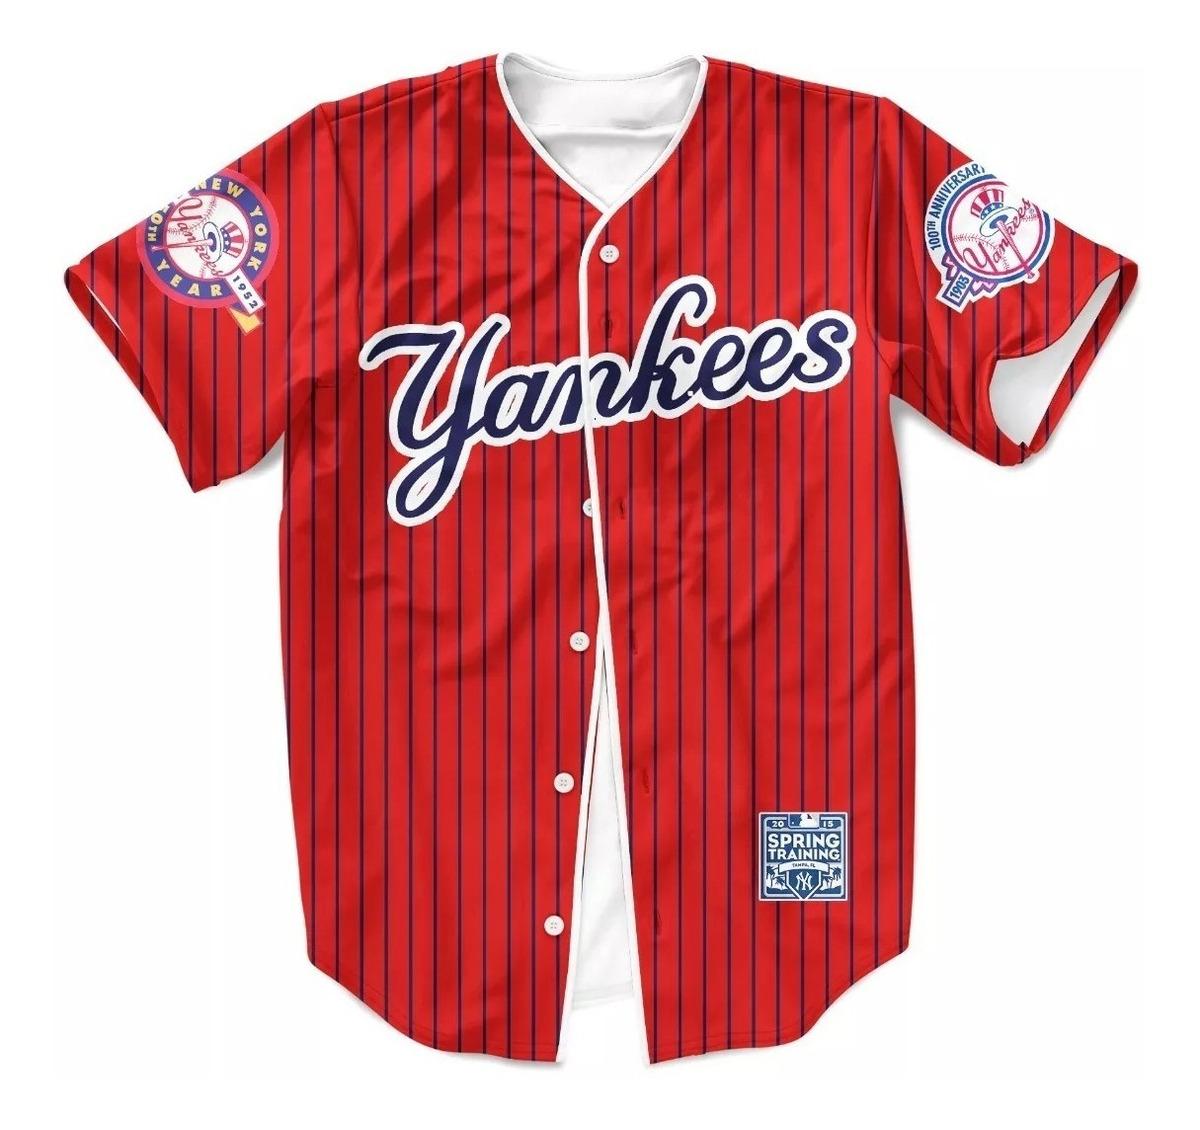 08180fda165537 esporte camisa jersey baseball swag ny botão usa brooklyn. Carregando zoom.